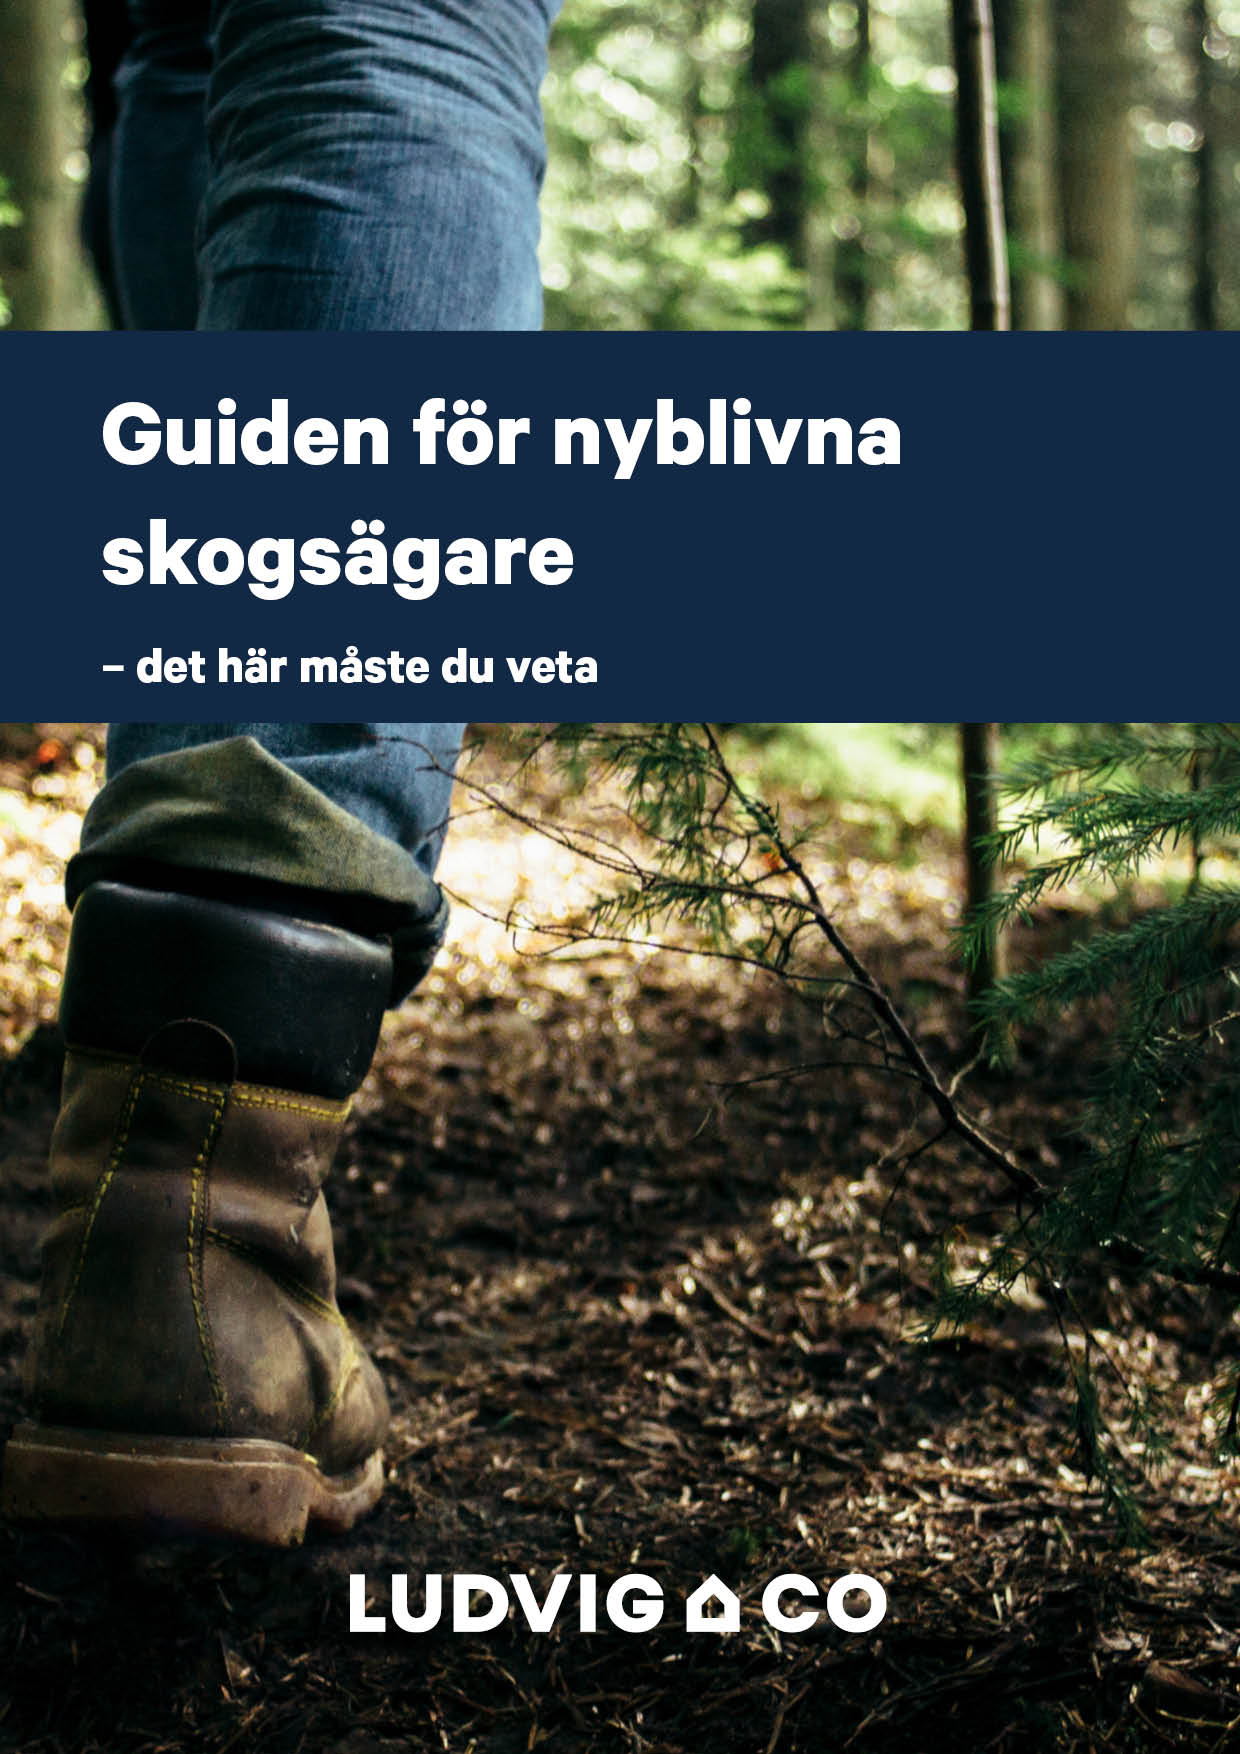 Guiden for nyblivna skogsagare